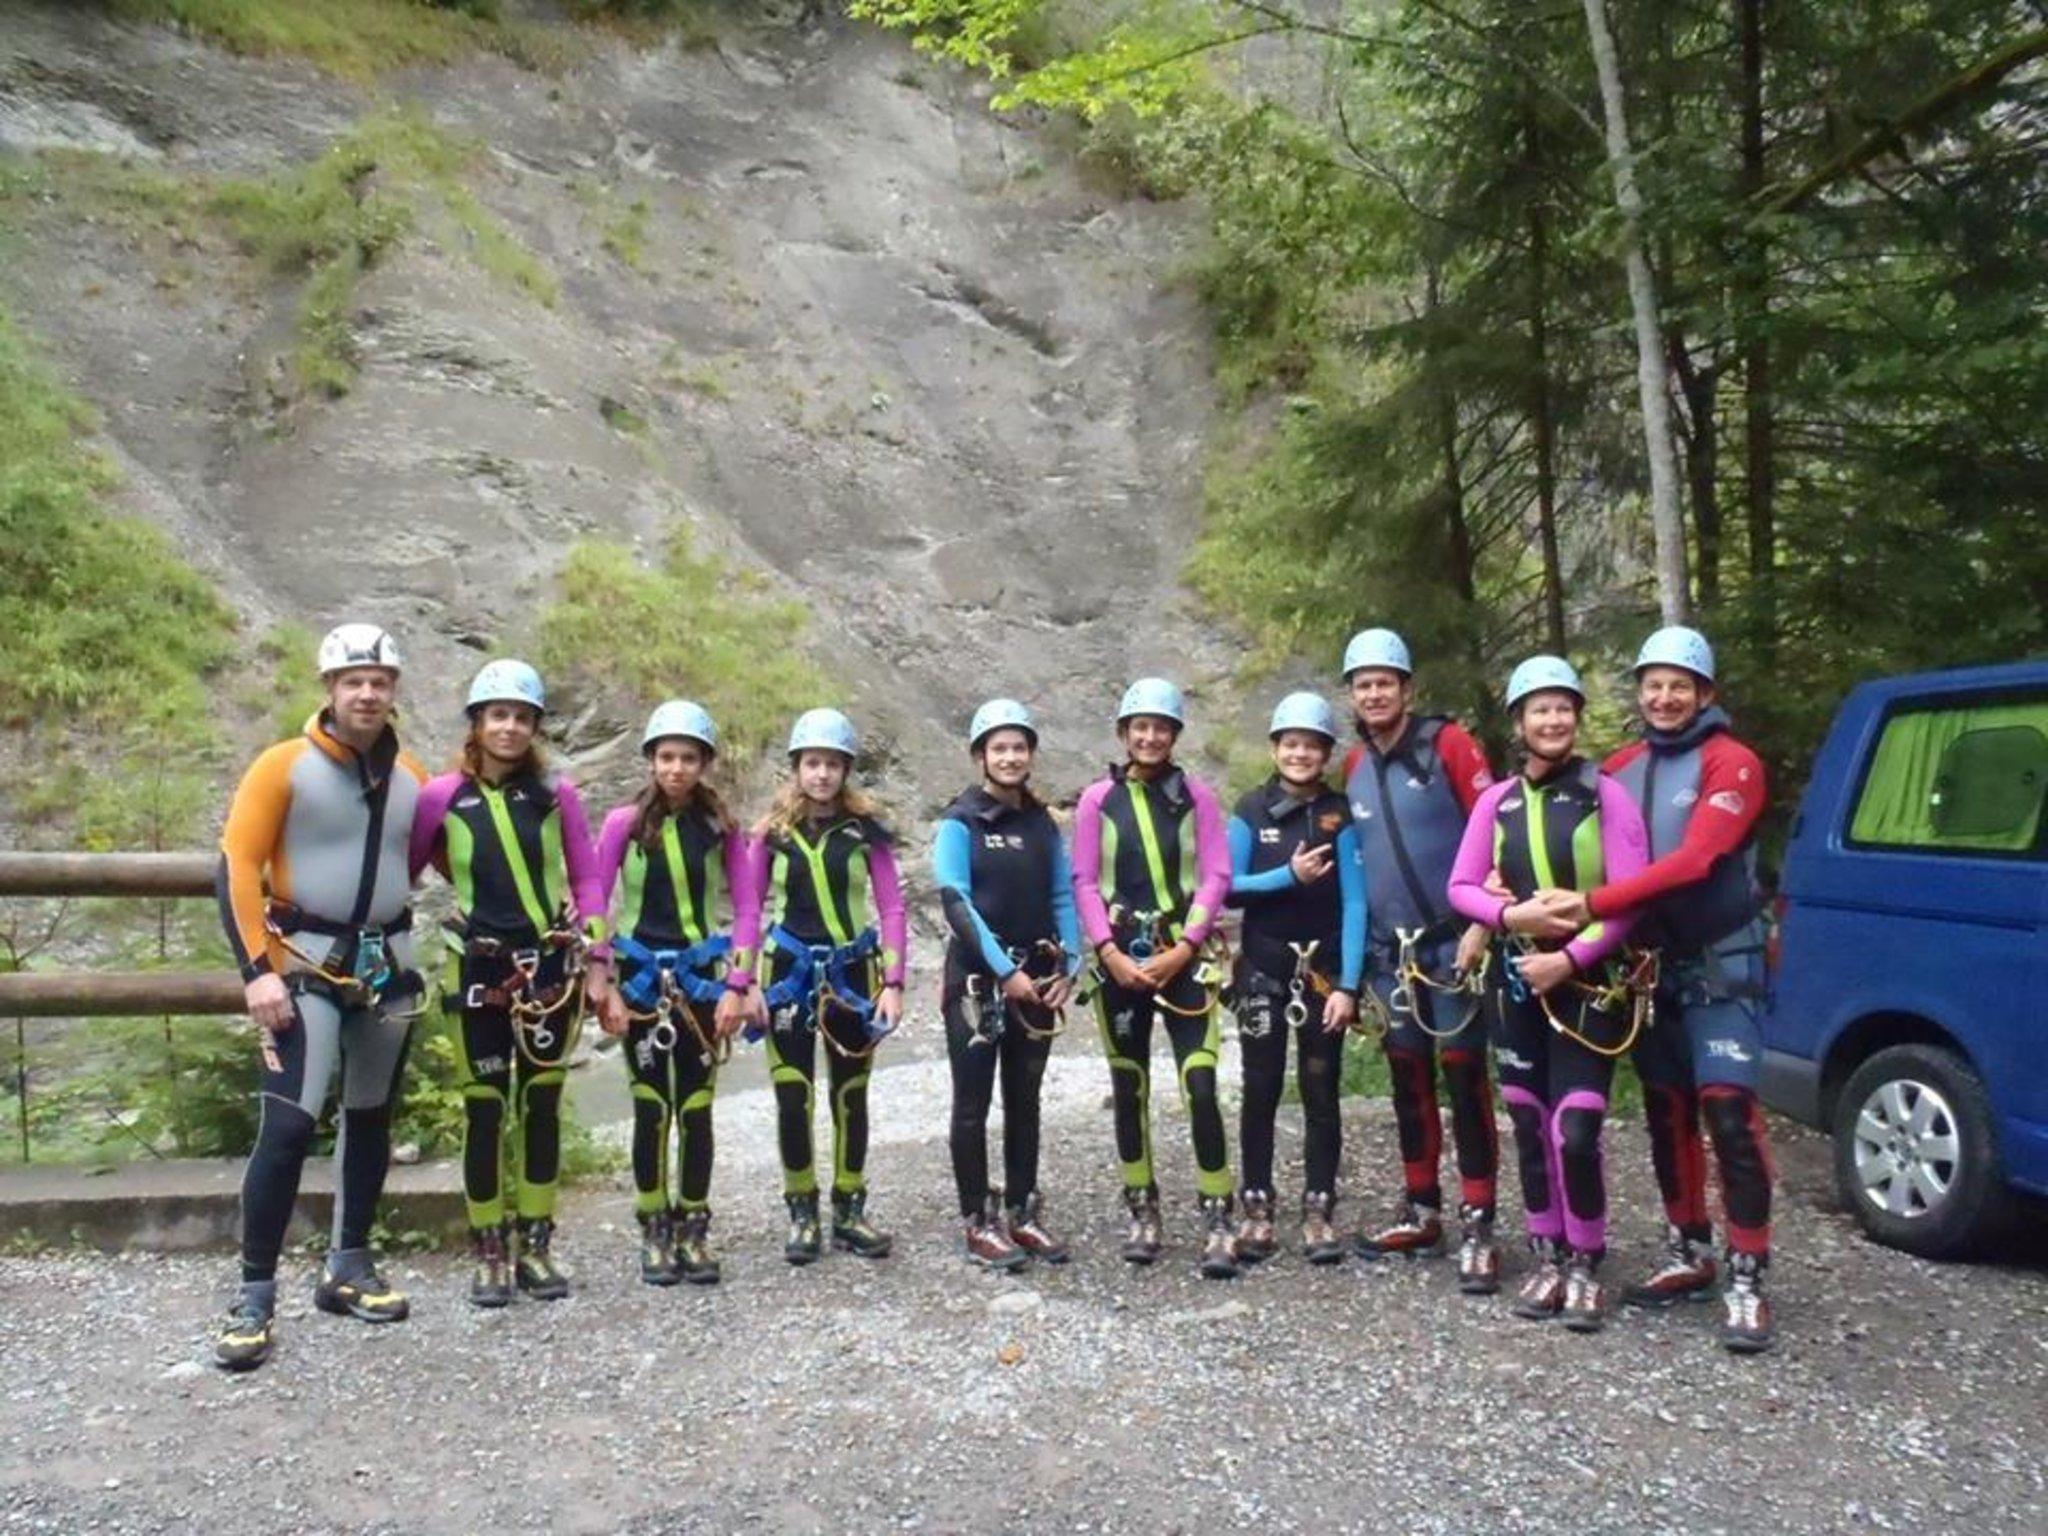 Klettersteigset Xxl Sport : Adventure camp des skiclub kraichgau e.v. region